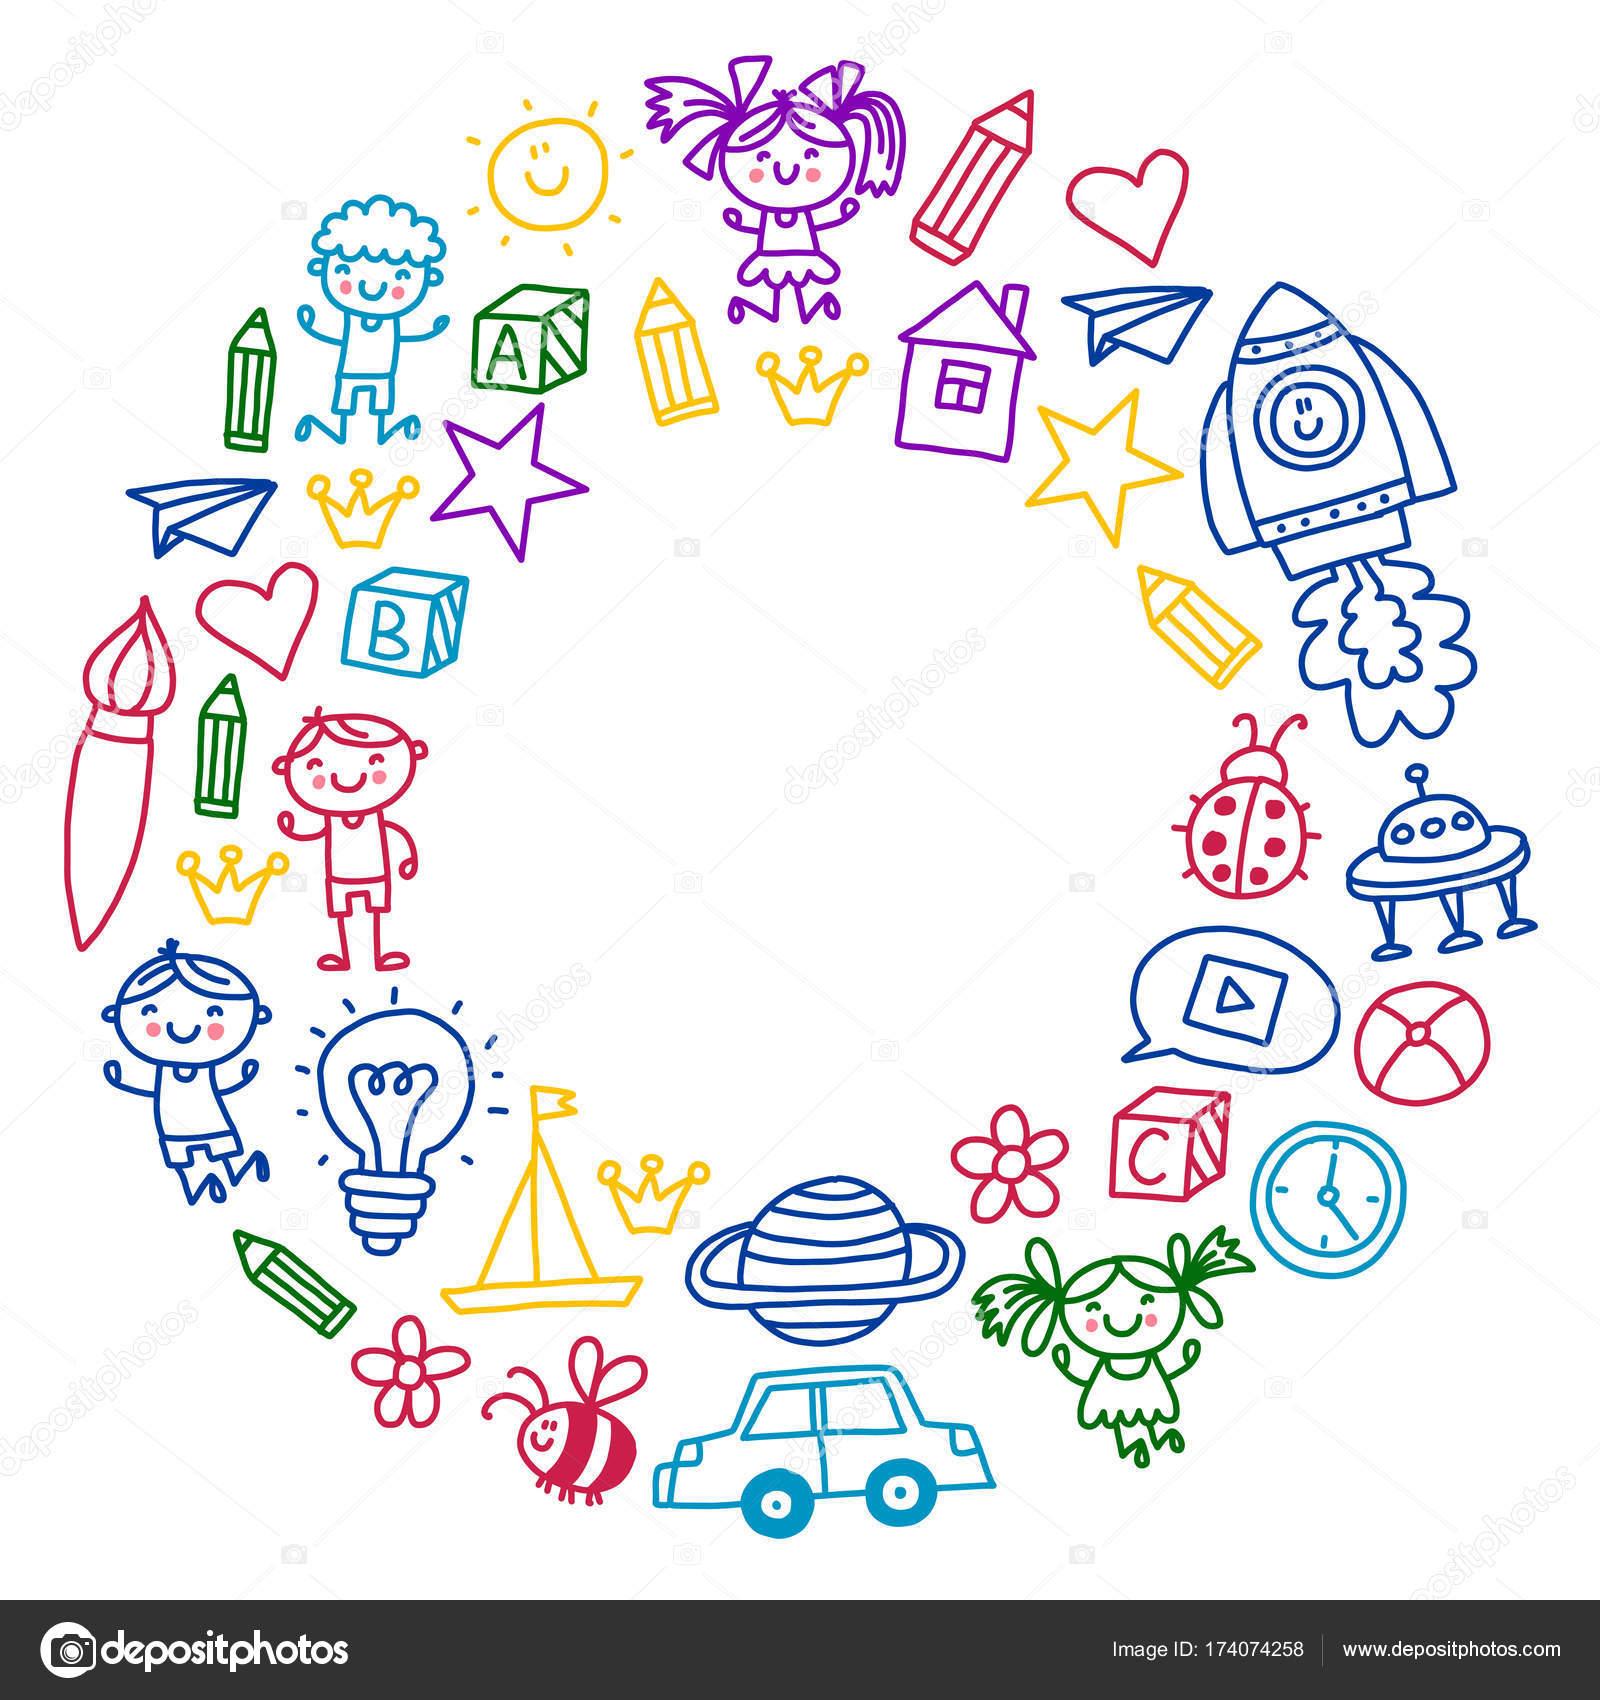 Worksheet Imagination Drawings